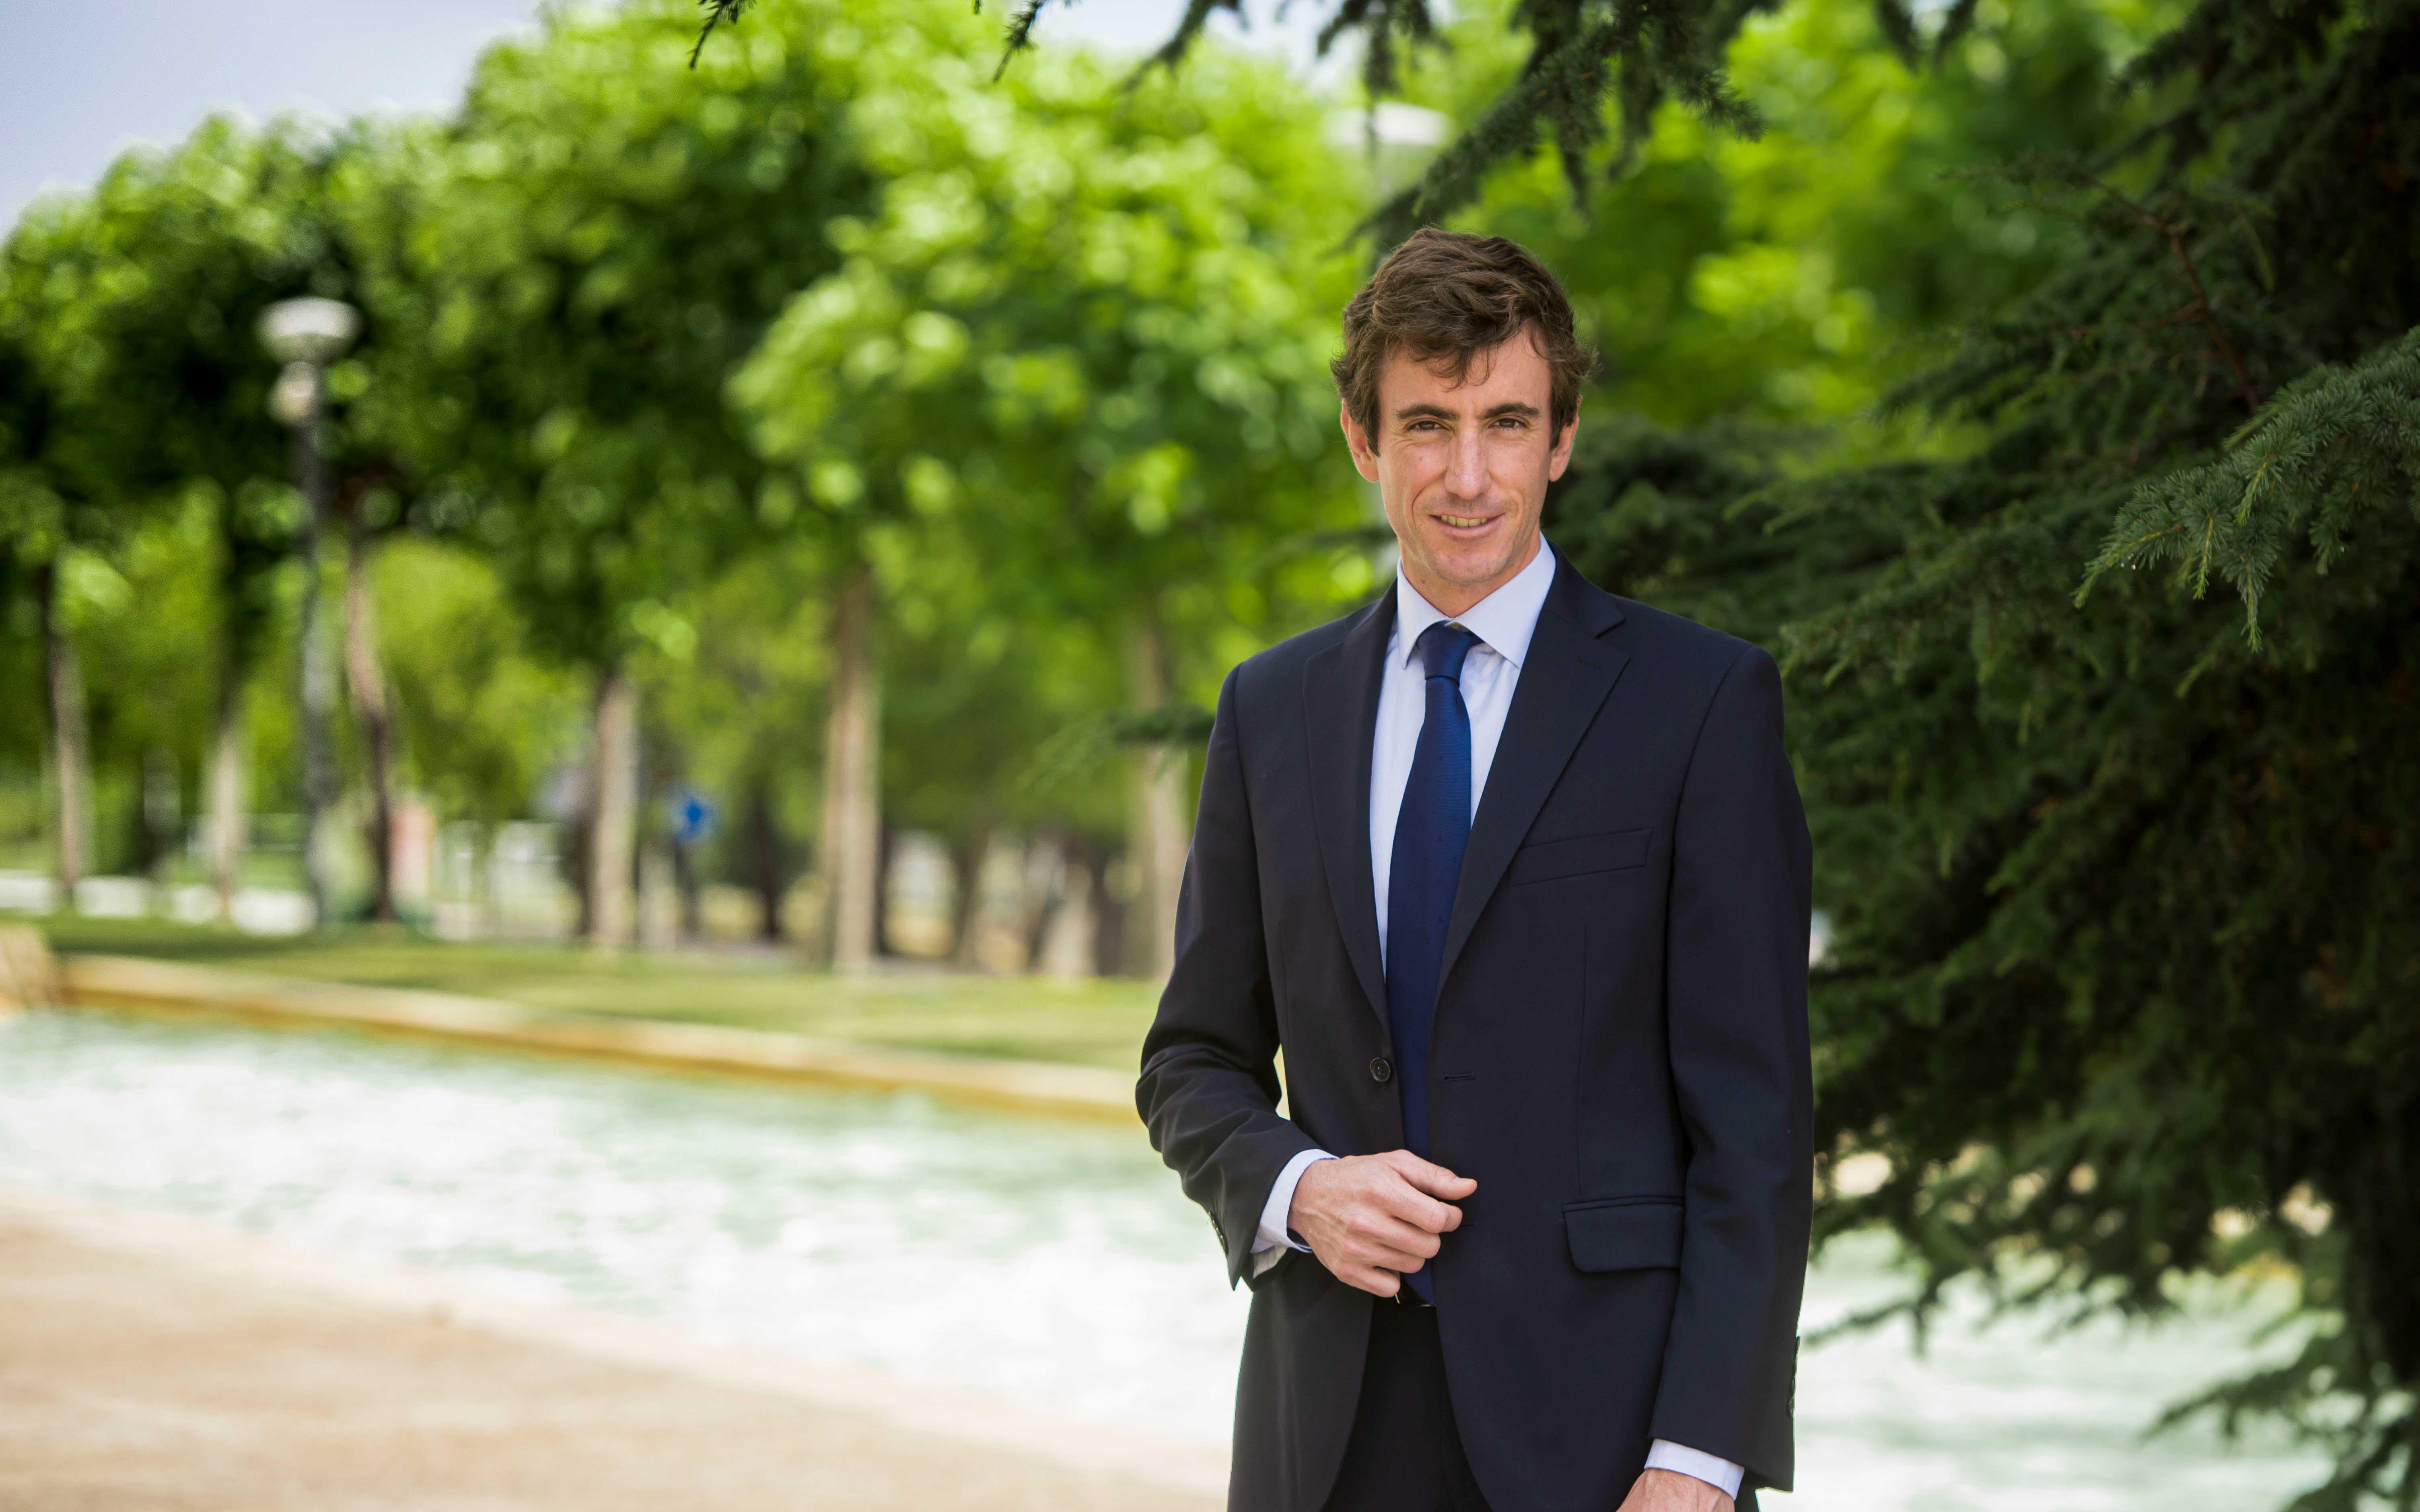 Jorge Sendagorta Cudós, new CEO of the SENER Group